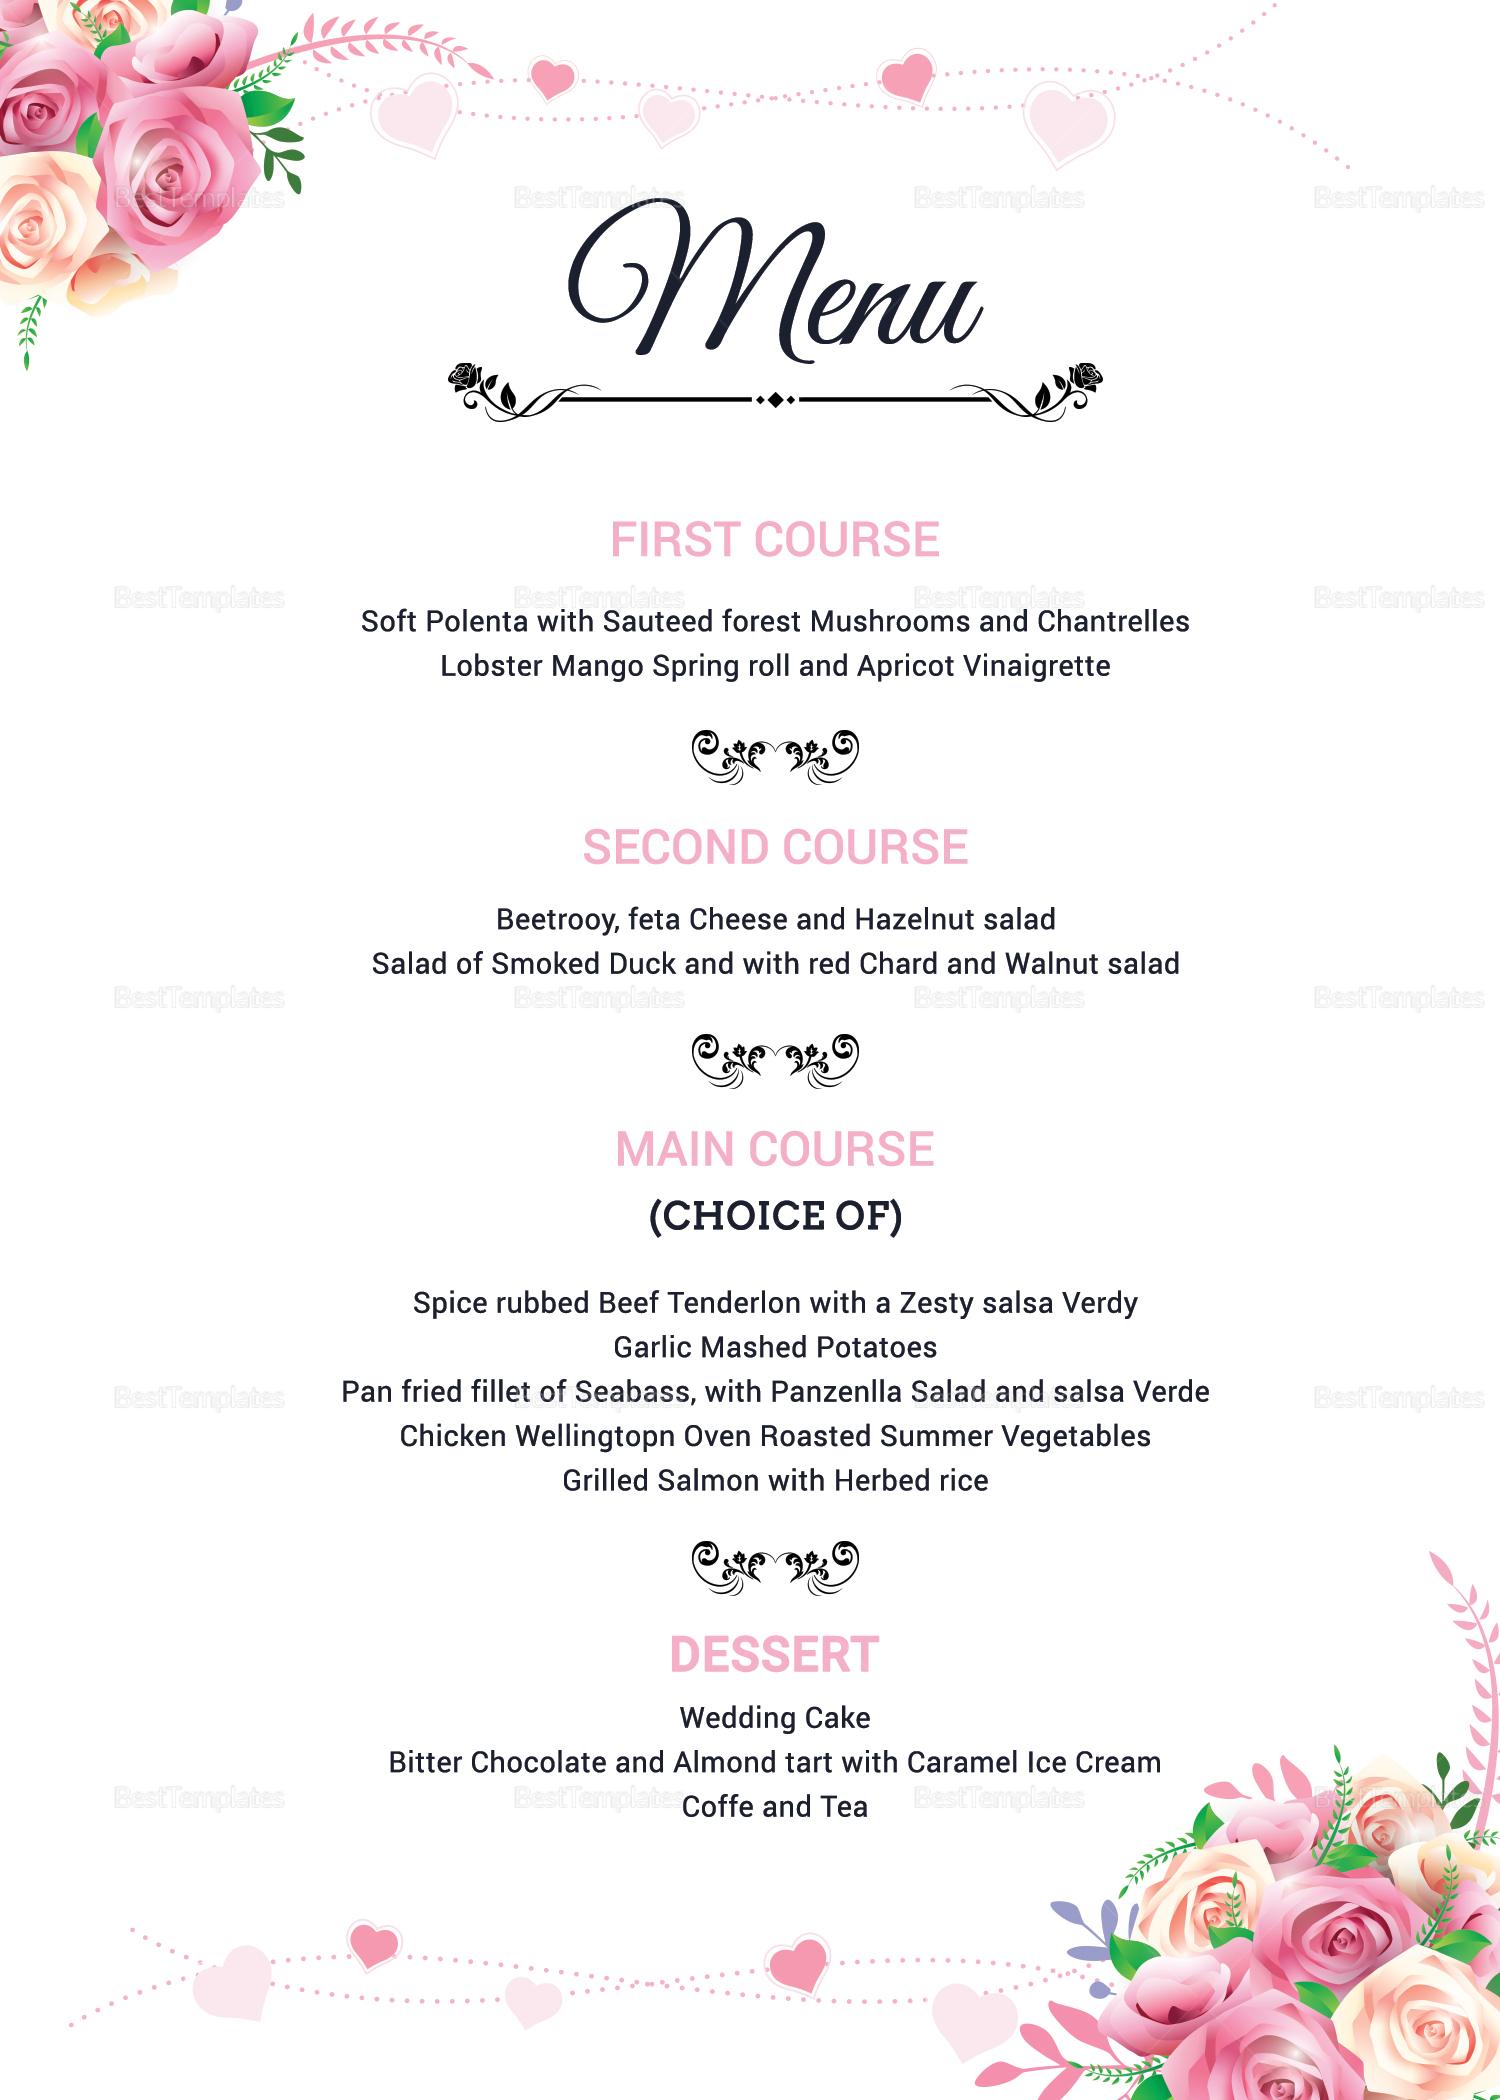 Floral Wedding Menu Invitation Design Template